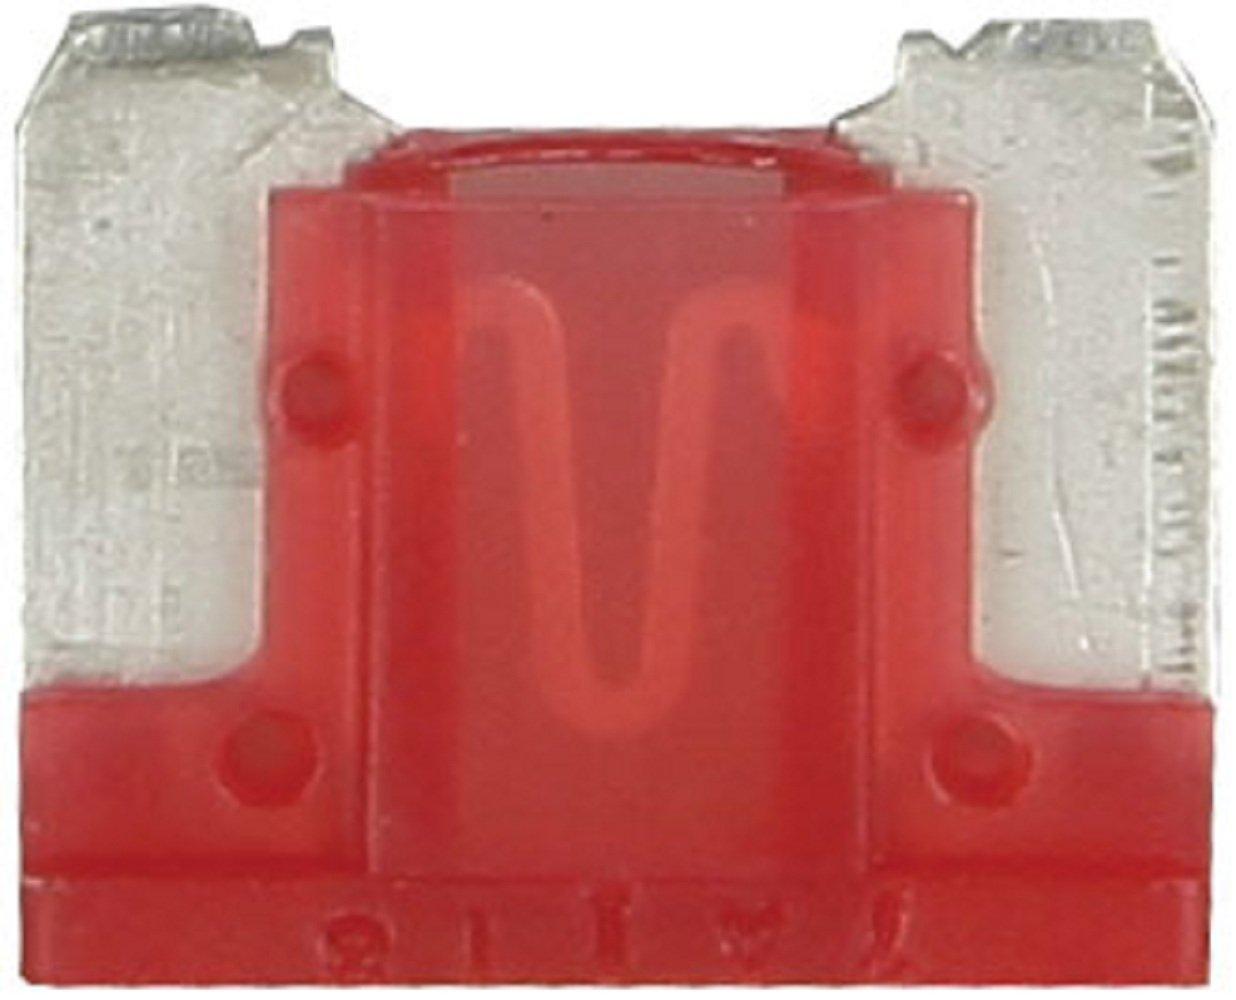 Install Bay USATMLP7.5-5 - 7.5 Amp Low Profile ATM Mini Fuse, 5-Pack Metra Electronics Corporation